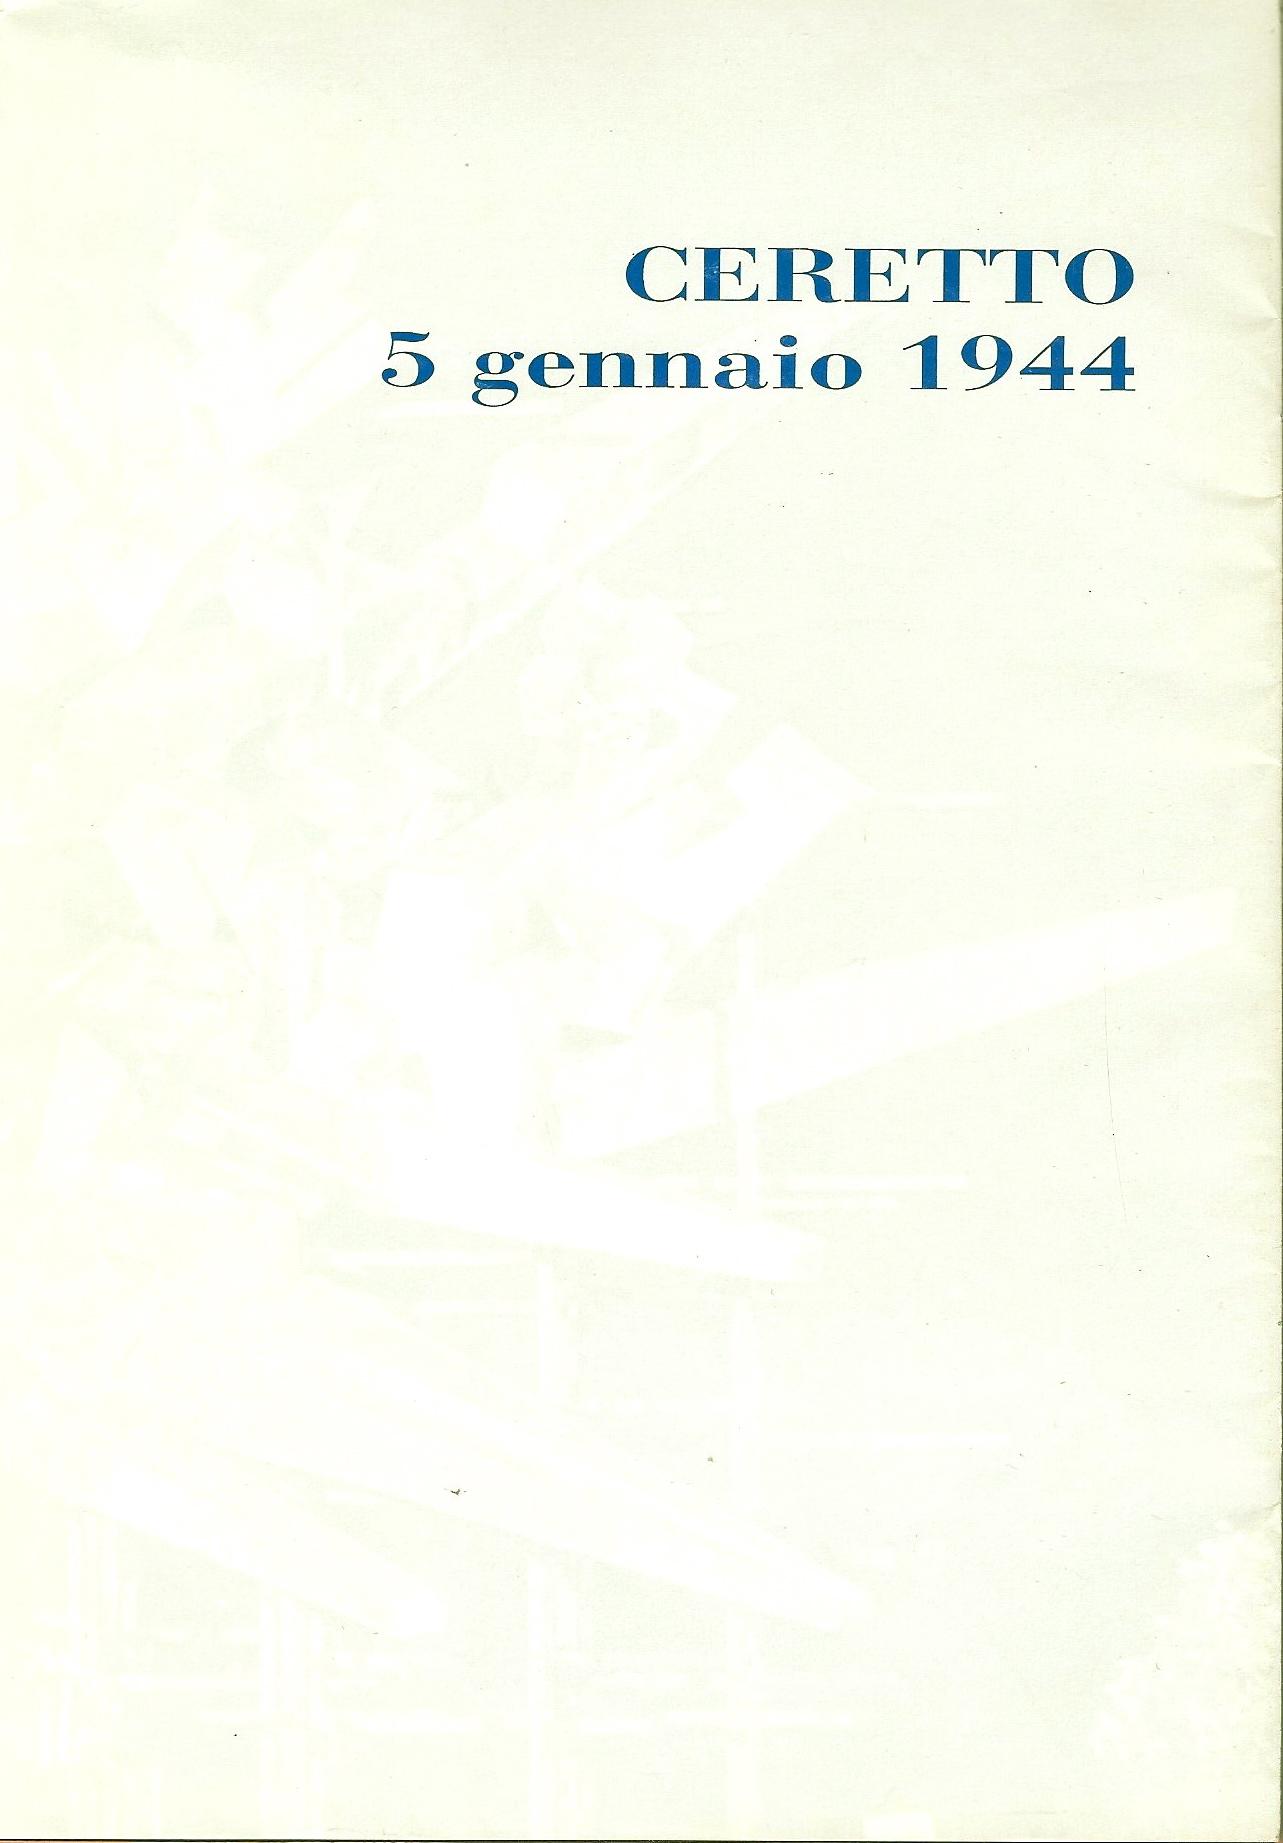 Ceretto 5 gennaio 1944